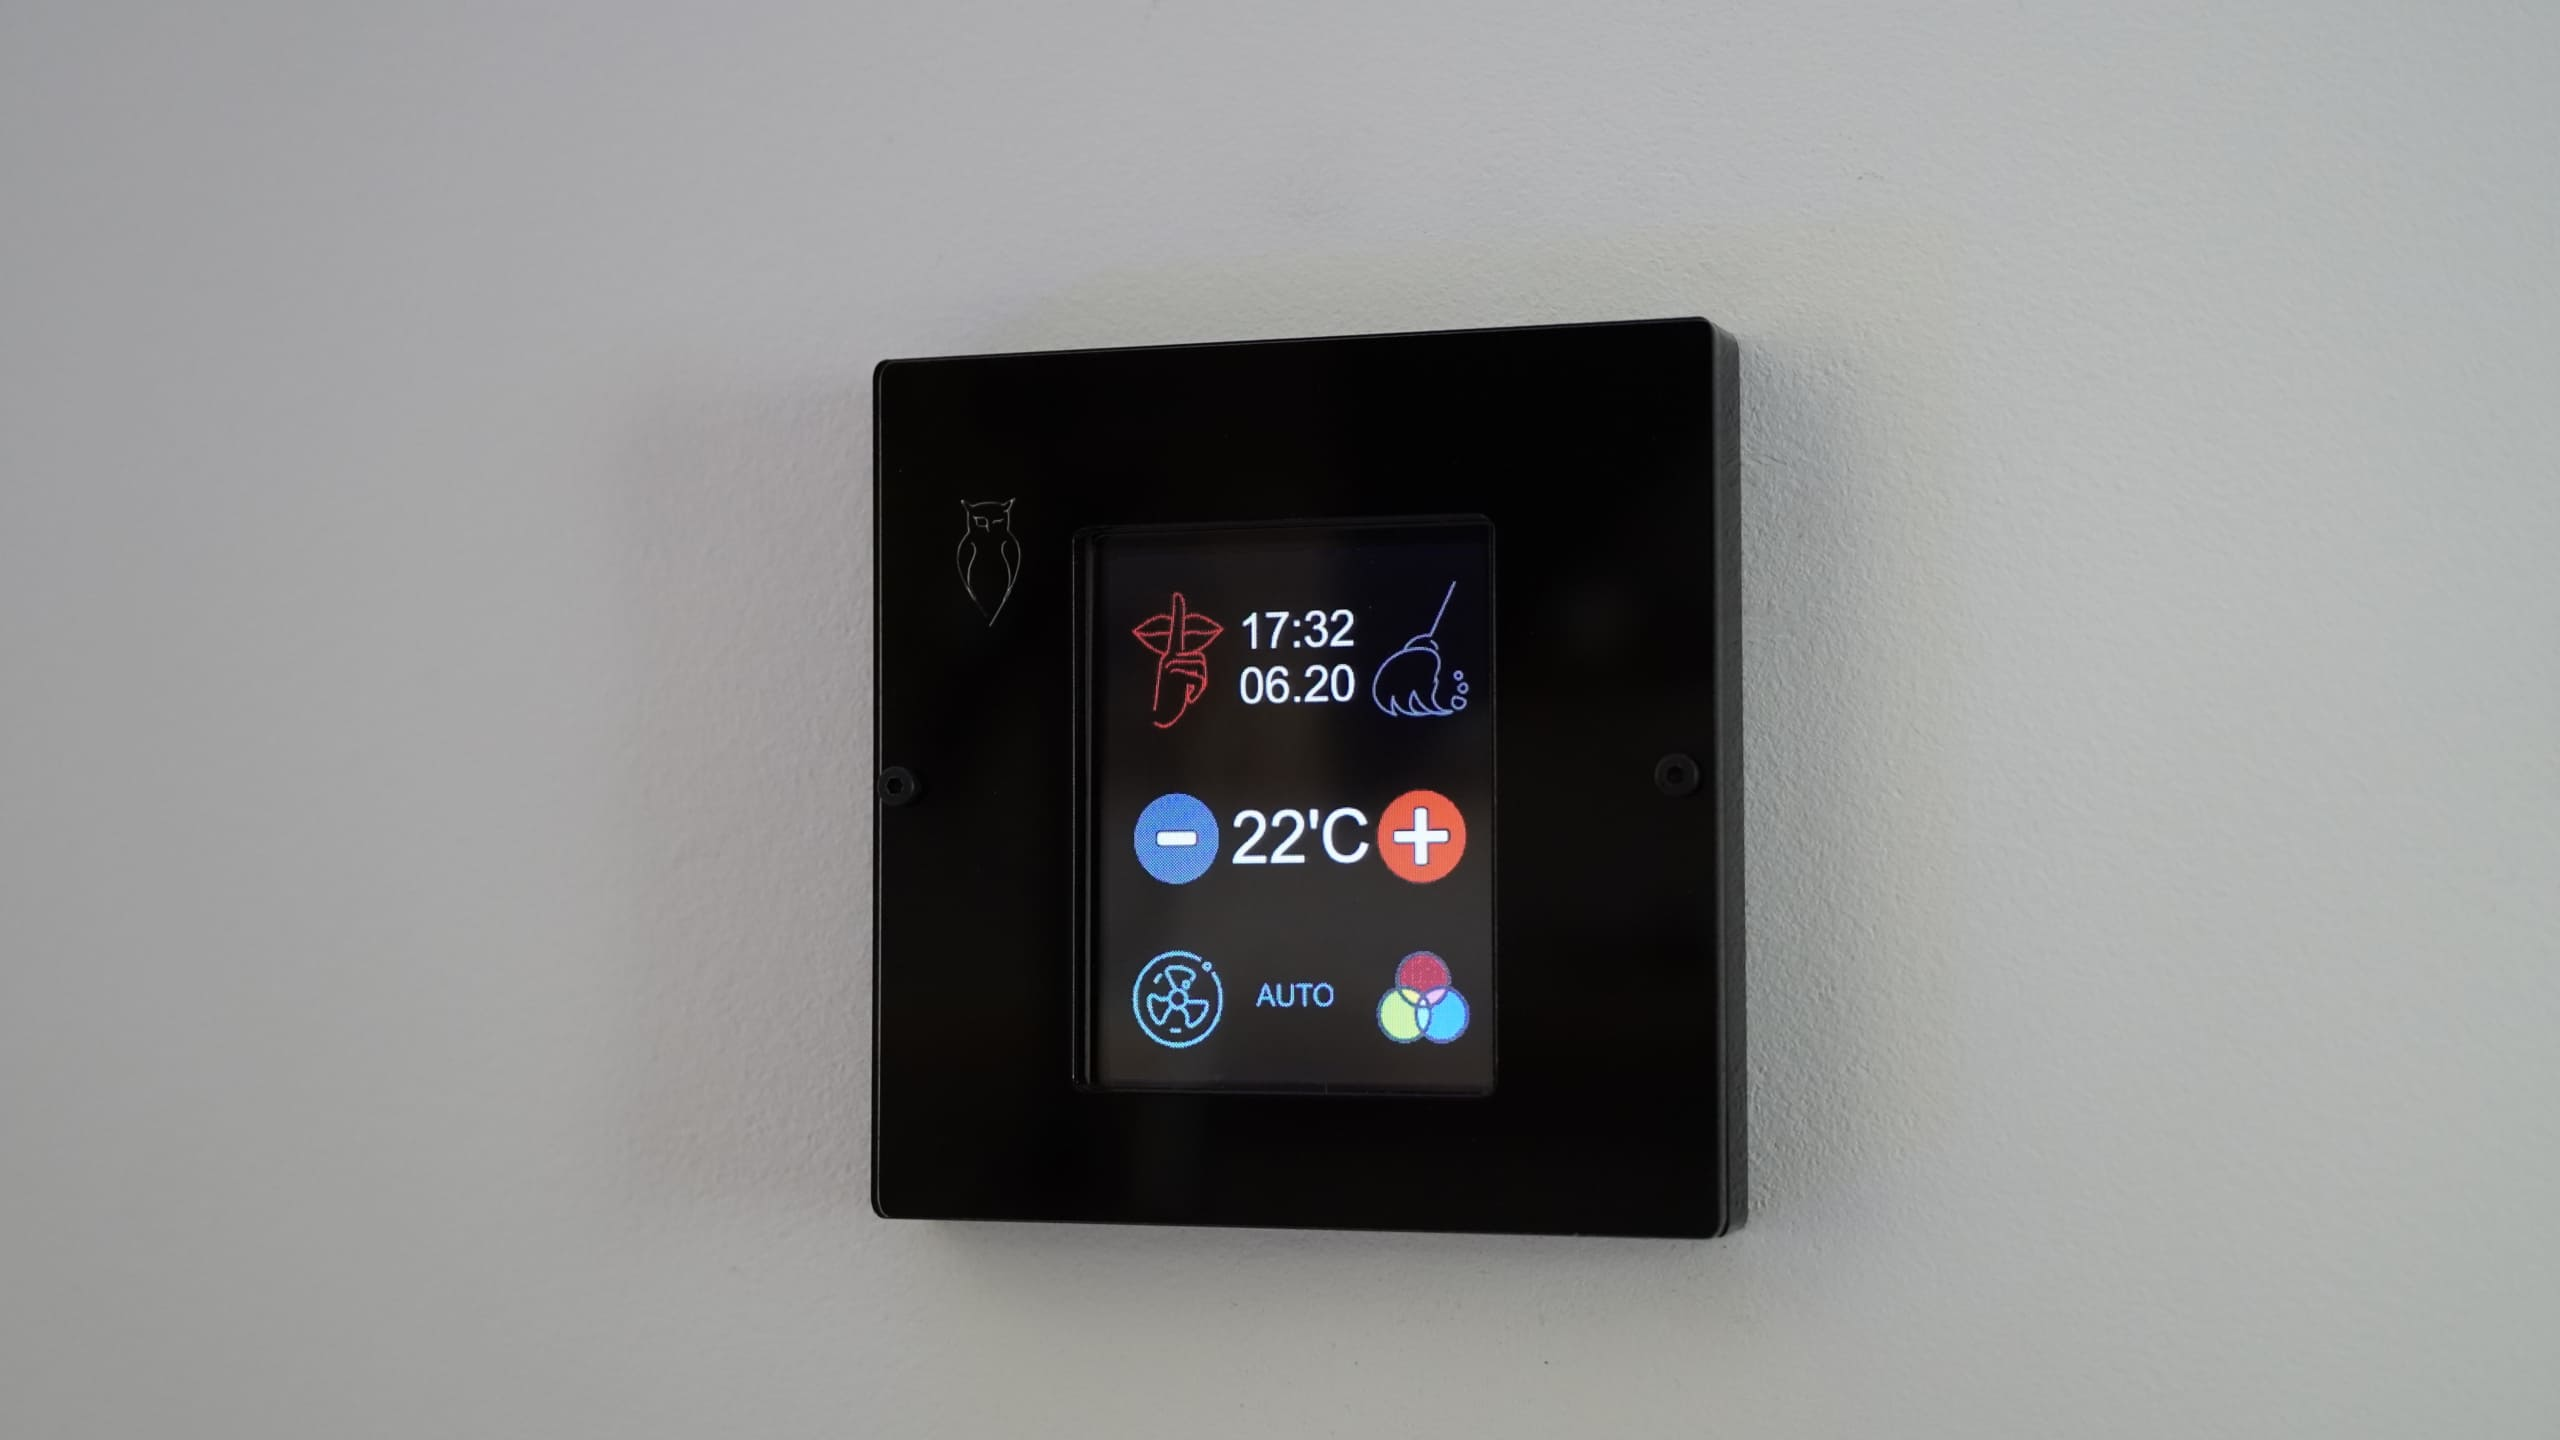 panel regulacji temperatury